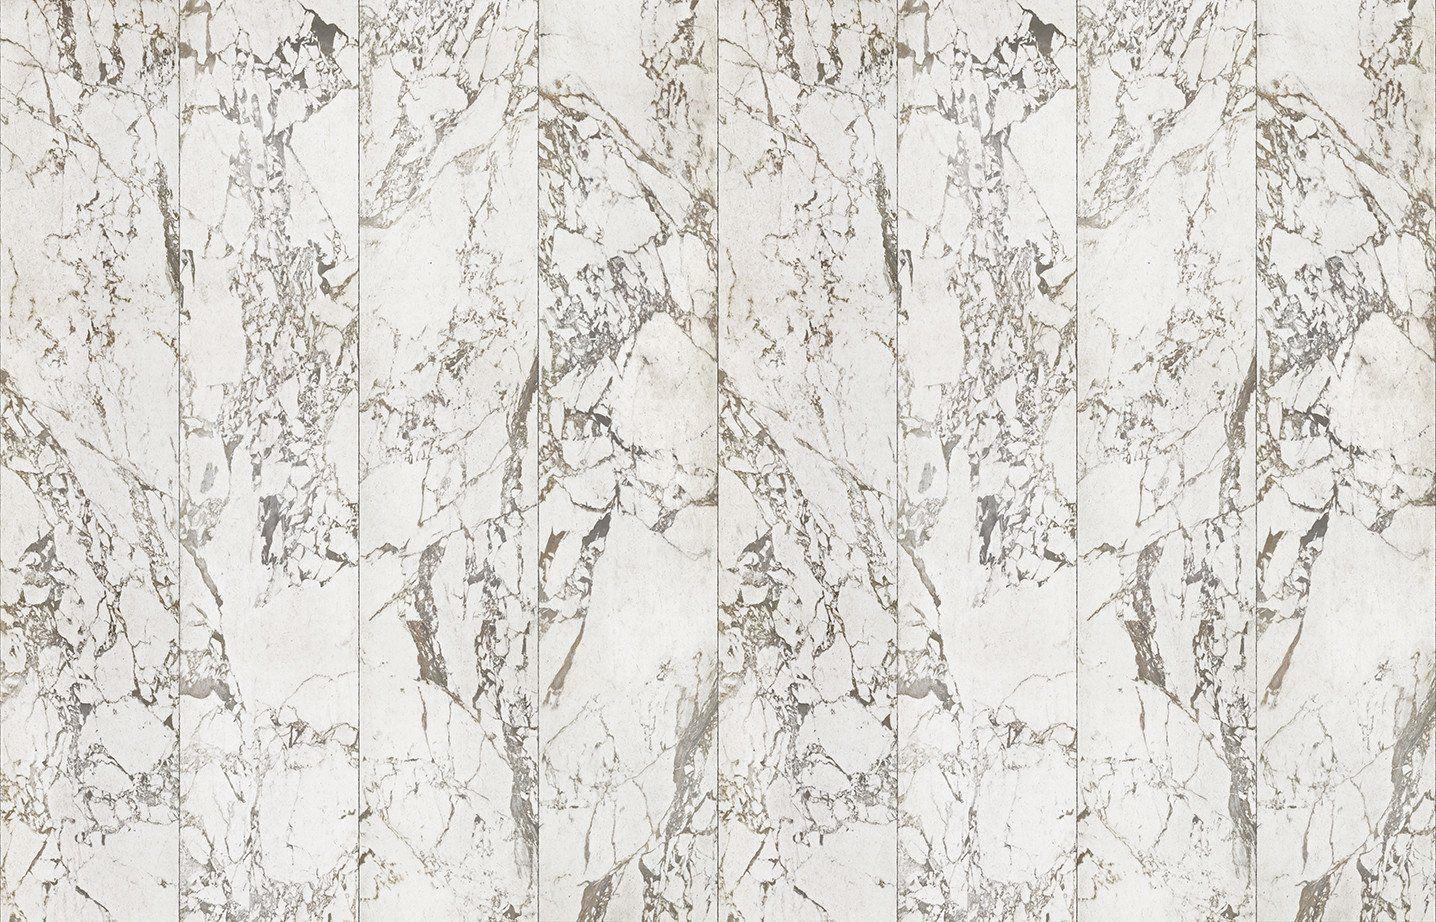 Marble Wallpaper Marble Wallpaper Hd Wallpaper For You The Best Hd Wallpaper For Desktop Mobile